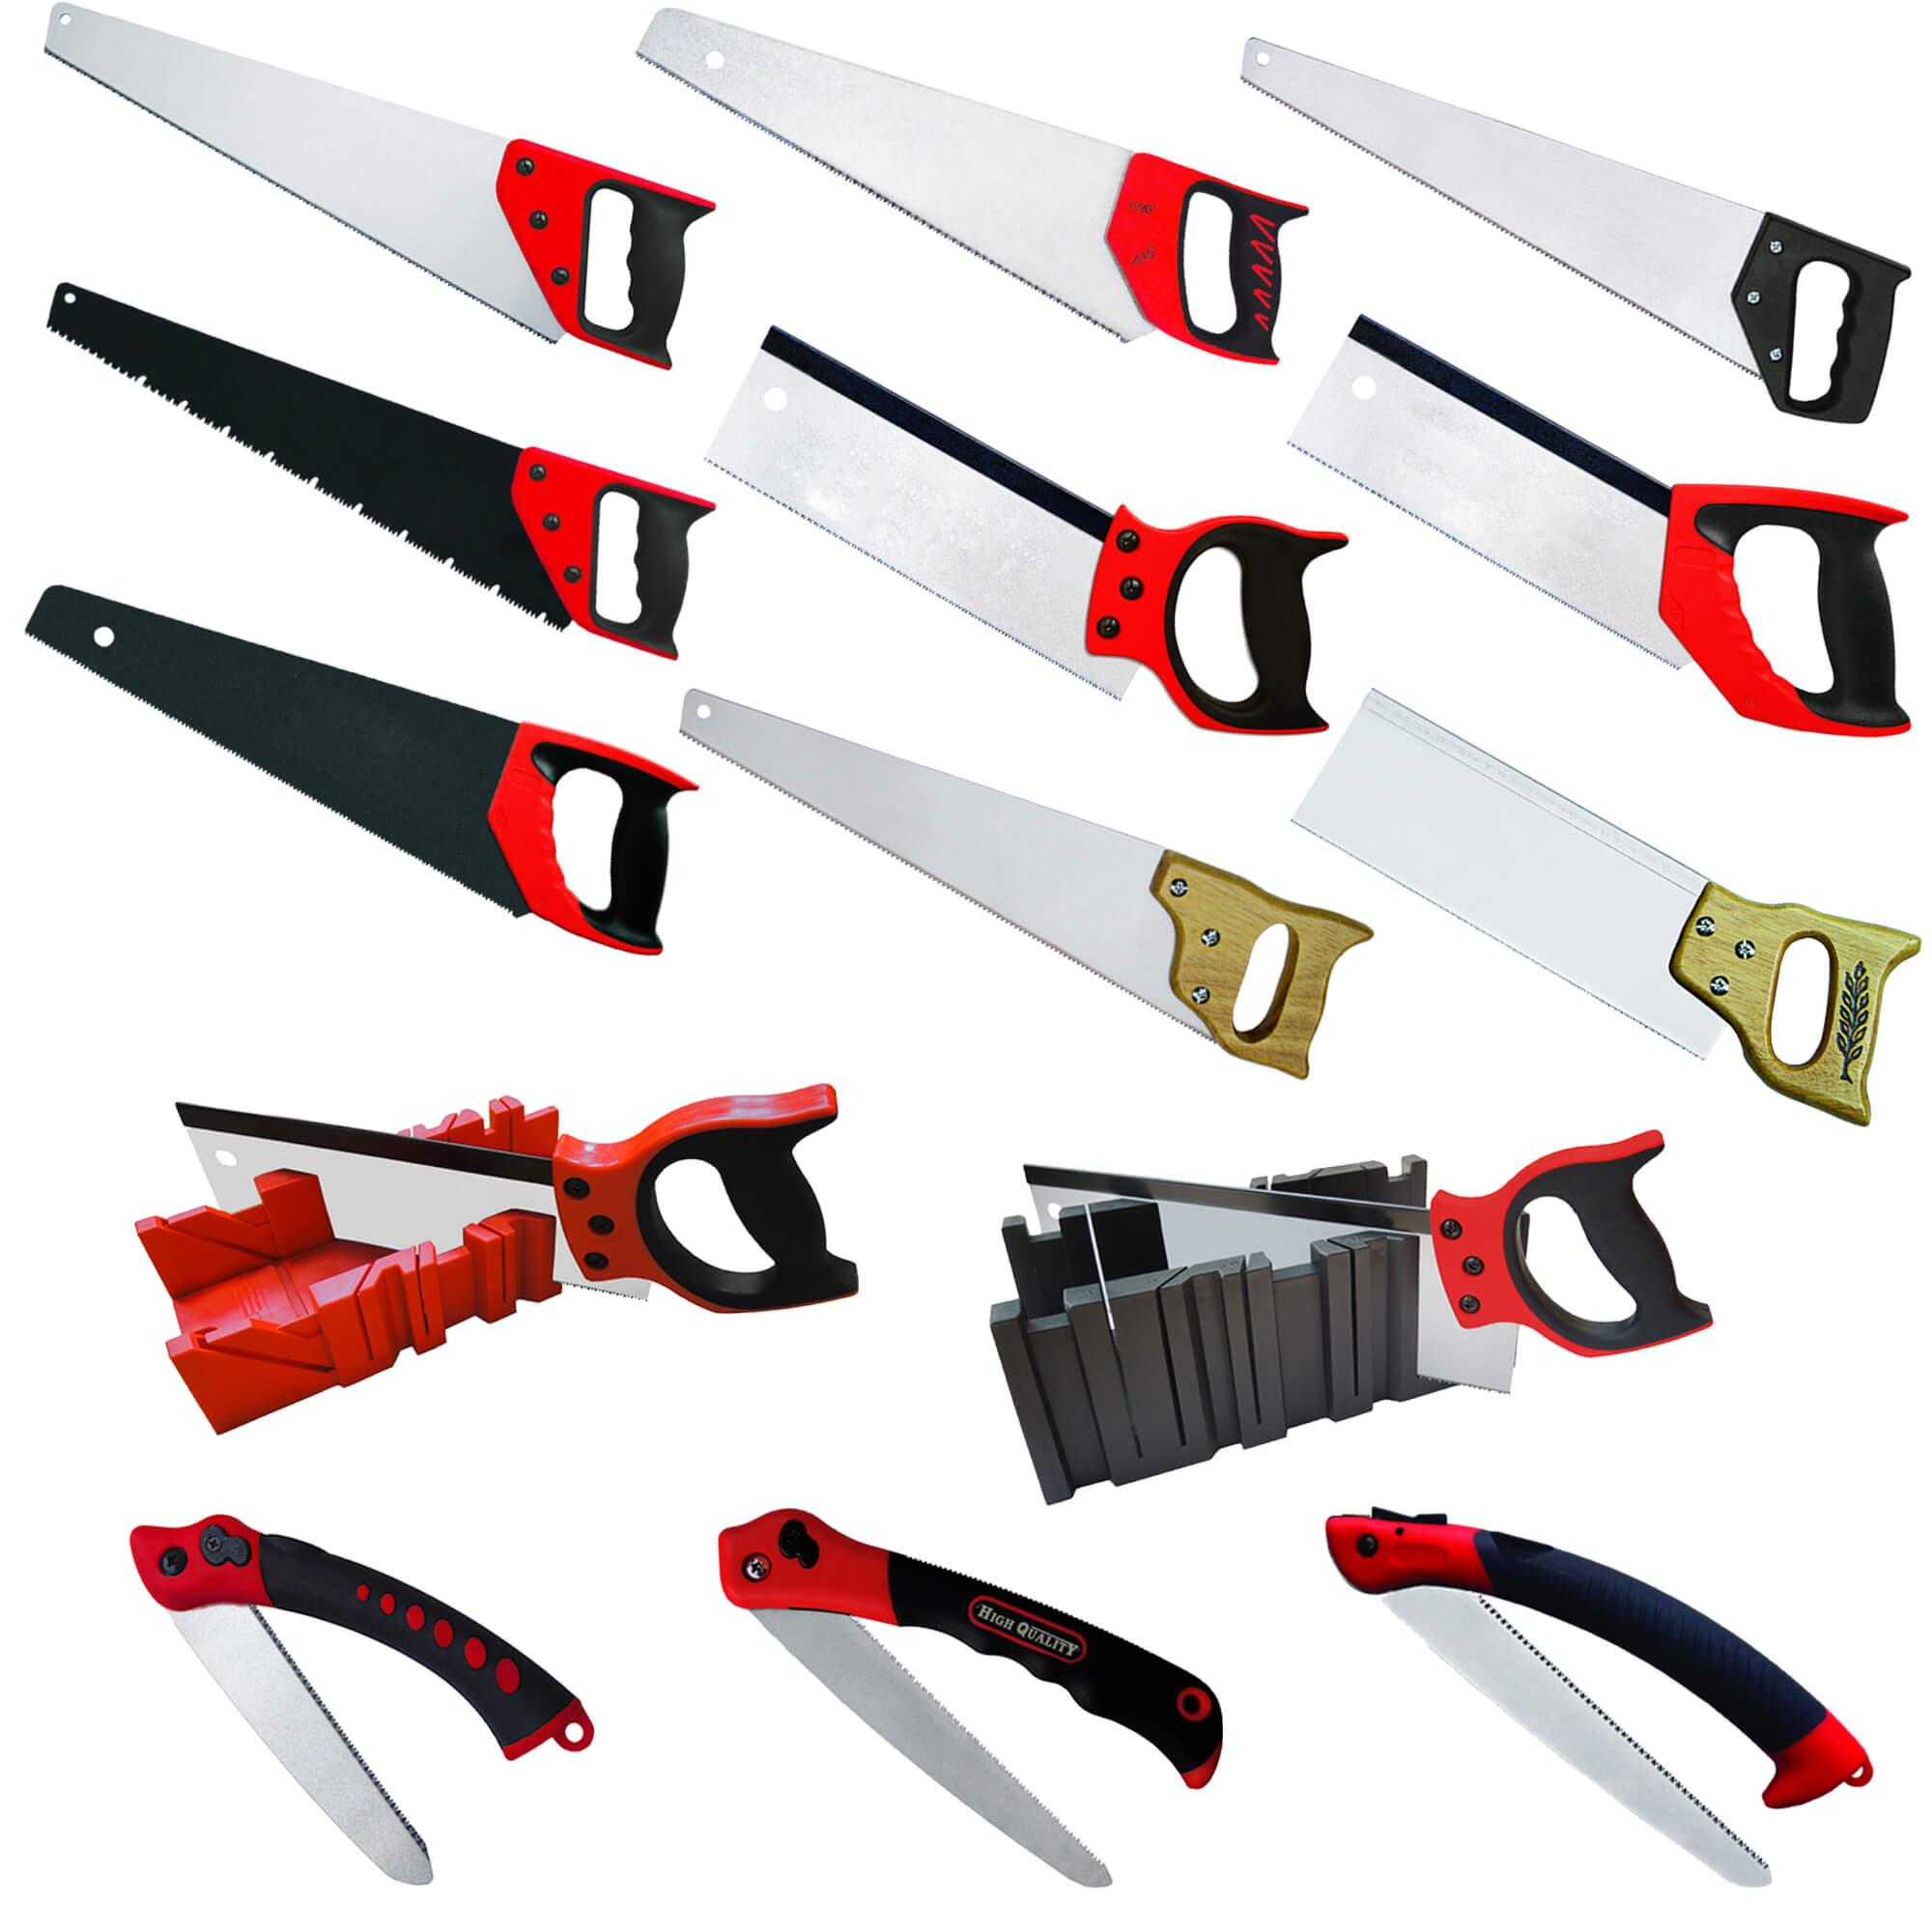 Pruning Saw, Folding Saw, Hacksaw, Woodworking Hand Saw, Japanese Saw, Drywall Saw, Tree Pruner, Junior Hacksaw, Tenon Saw, hand saw, garden saw, pruner